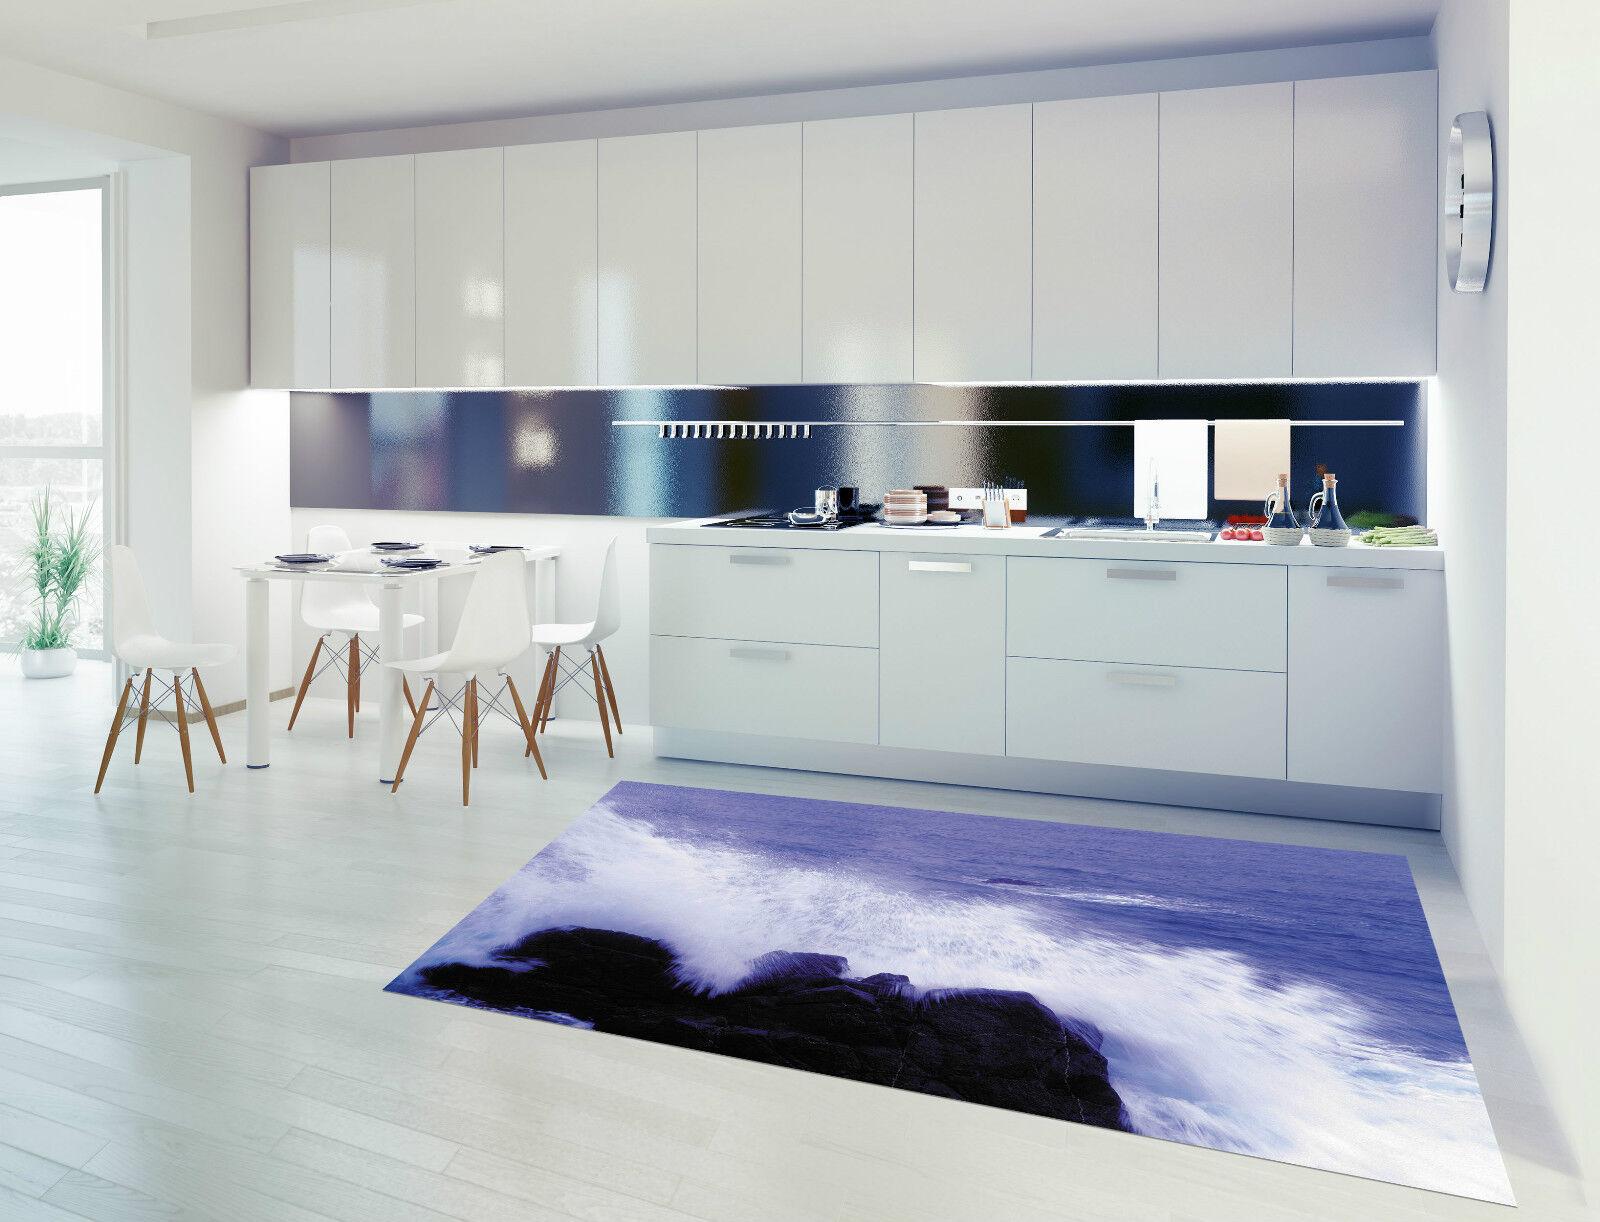 3D Excited Waves Kitchen Mat Floor Murals Wall Print Wall Deco AJ WALLPAPER CA